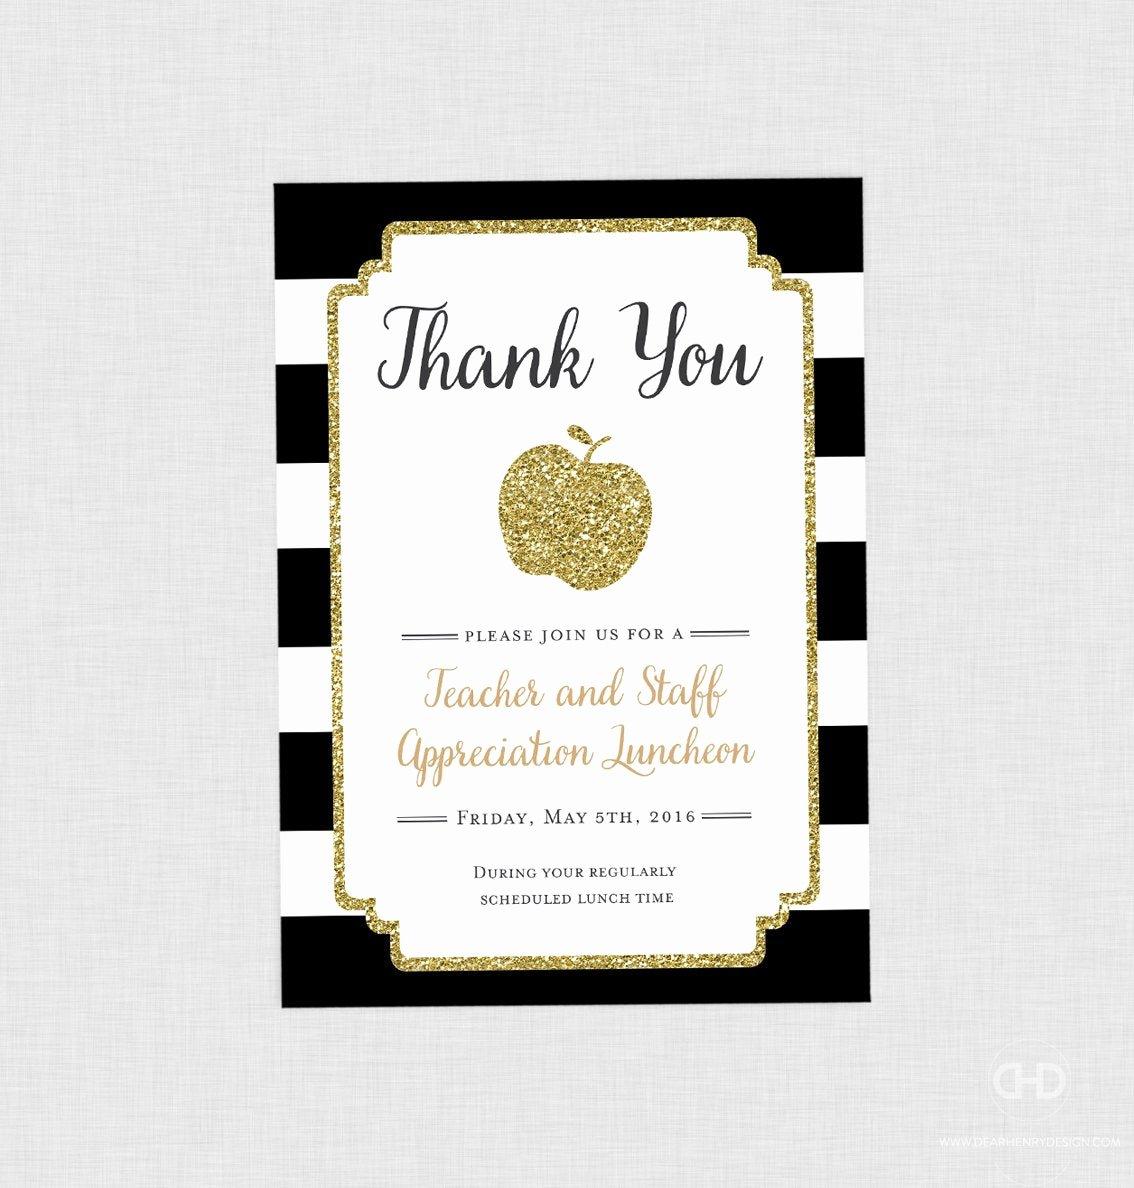 Employee Recognition Cards Template Fresh Teacher Appreciation Invitation Apple Printable Teacher